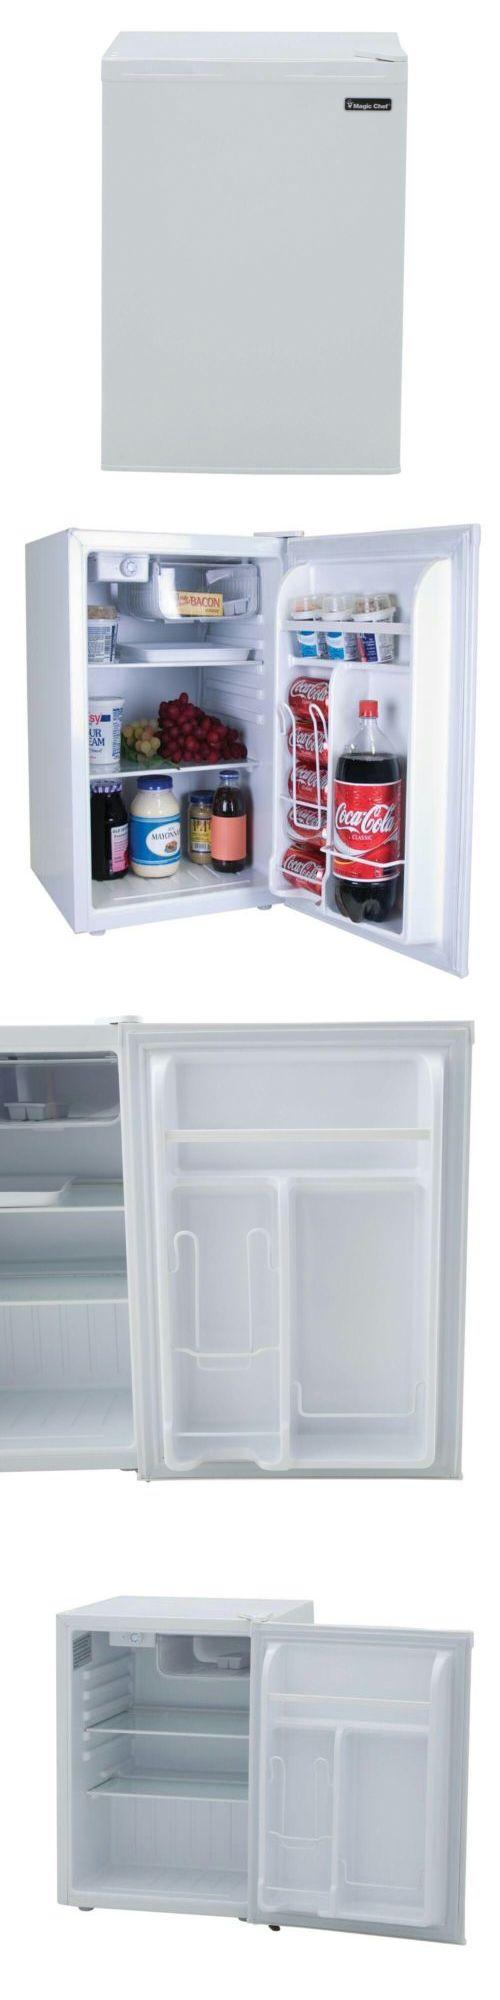 Mini Fridges 71262 Magic Chef Mini Refrigerator 2 6 Cu Ft